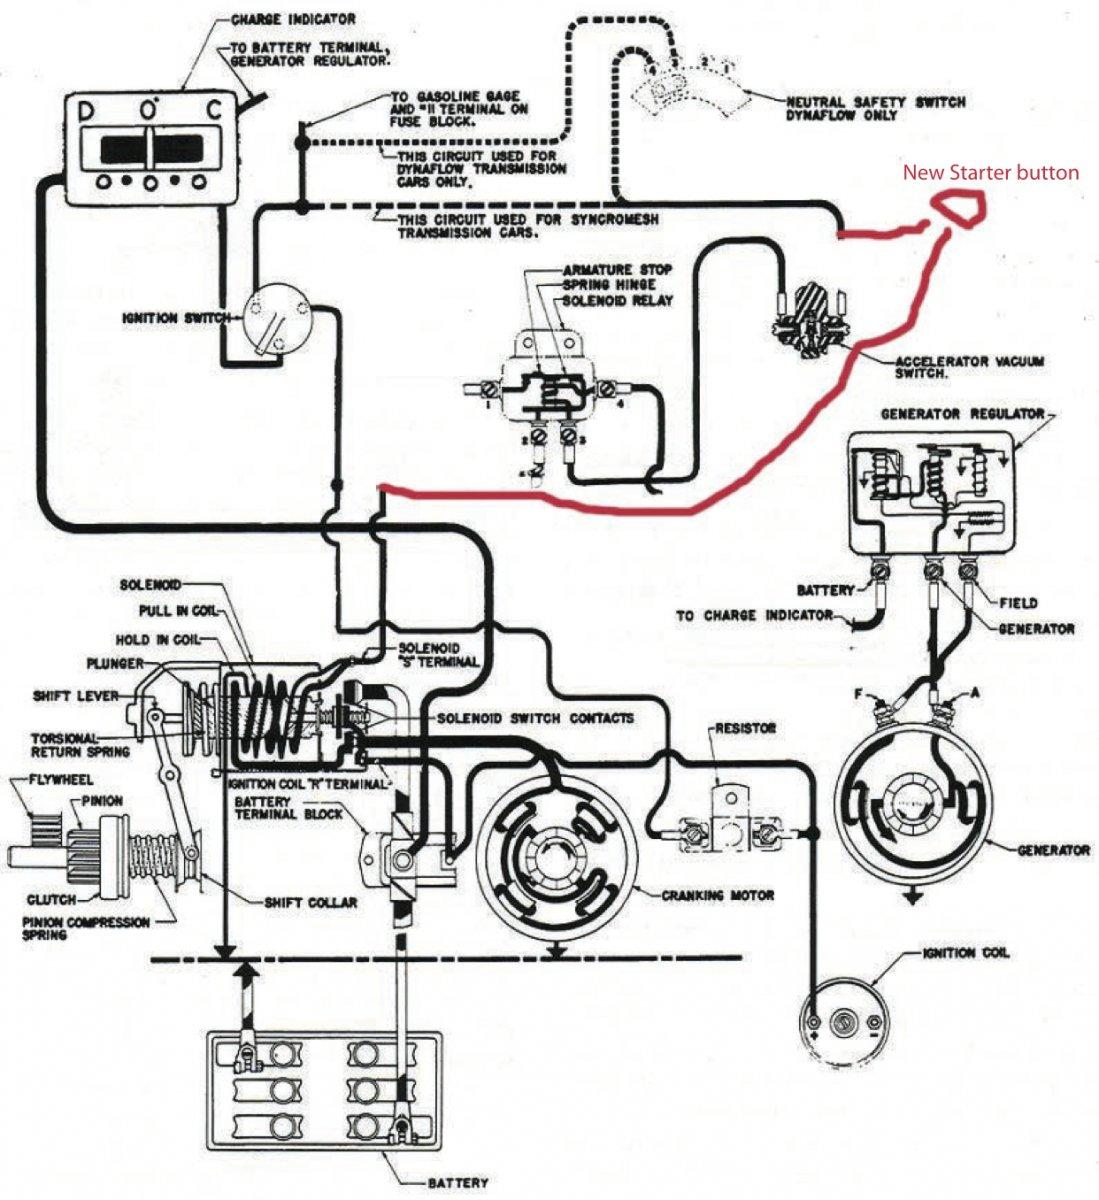 Buick Starter Generator Wiring Diagram Wire Center Hitachi Golf Cart Technical Help Needed 56 W 401 Nailhead The H A M B Rh Jalopyjournal Com